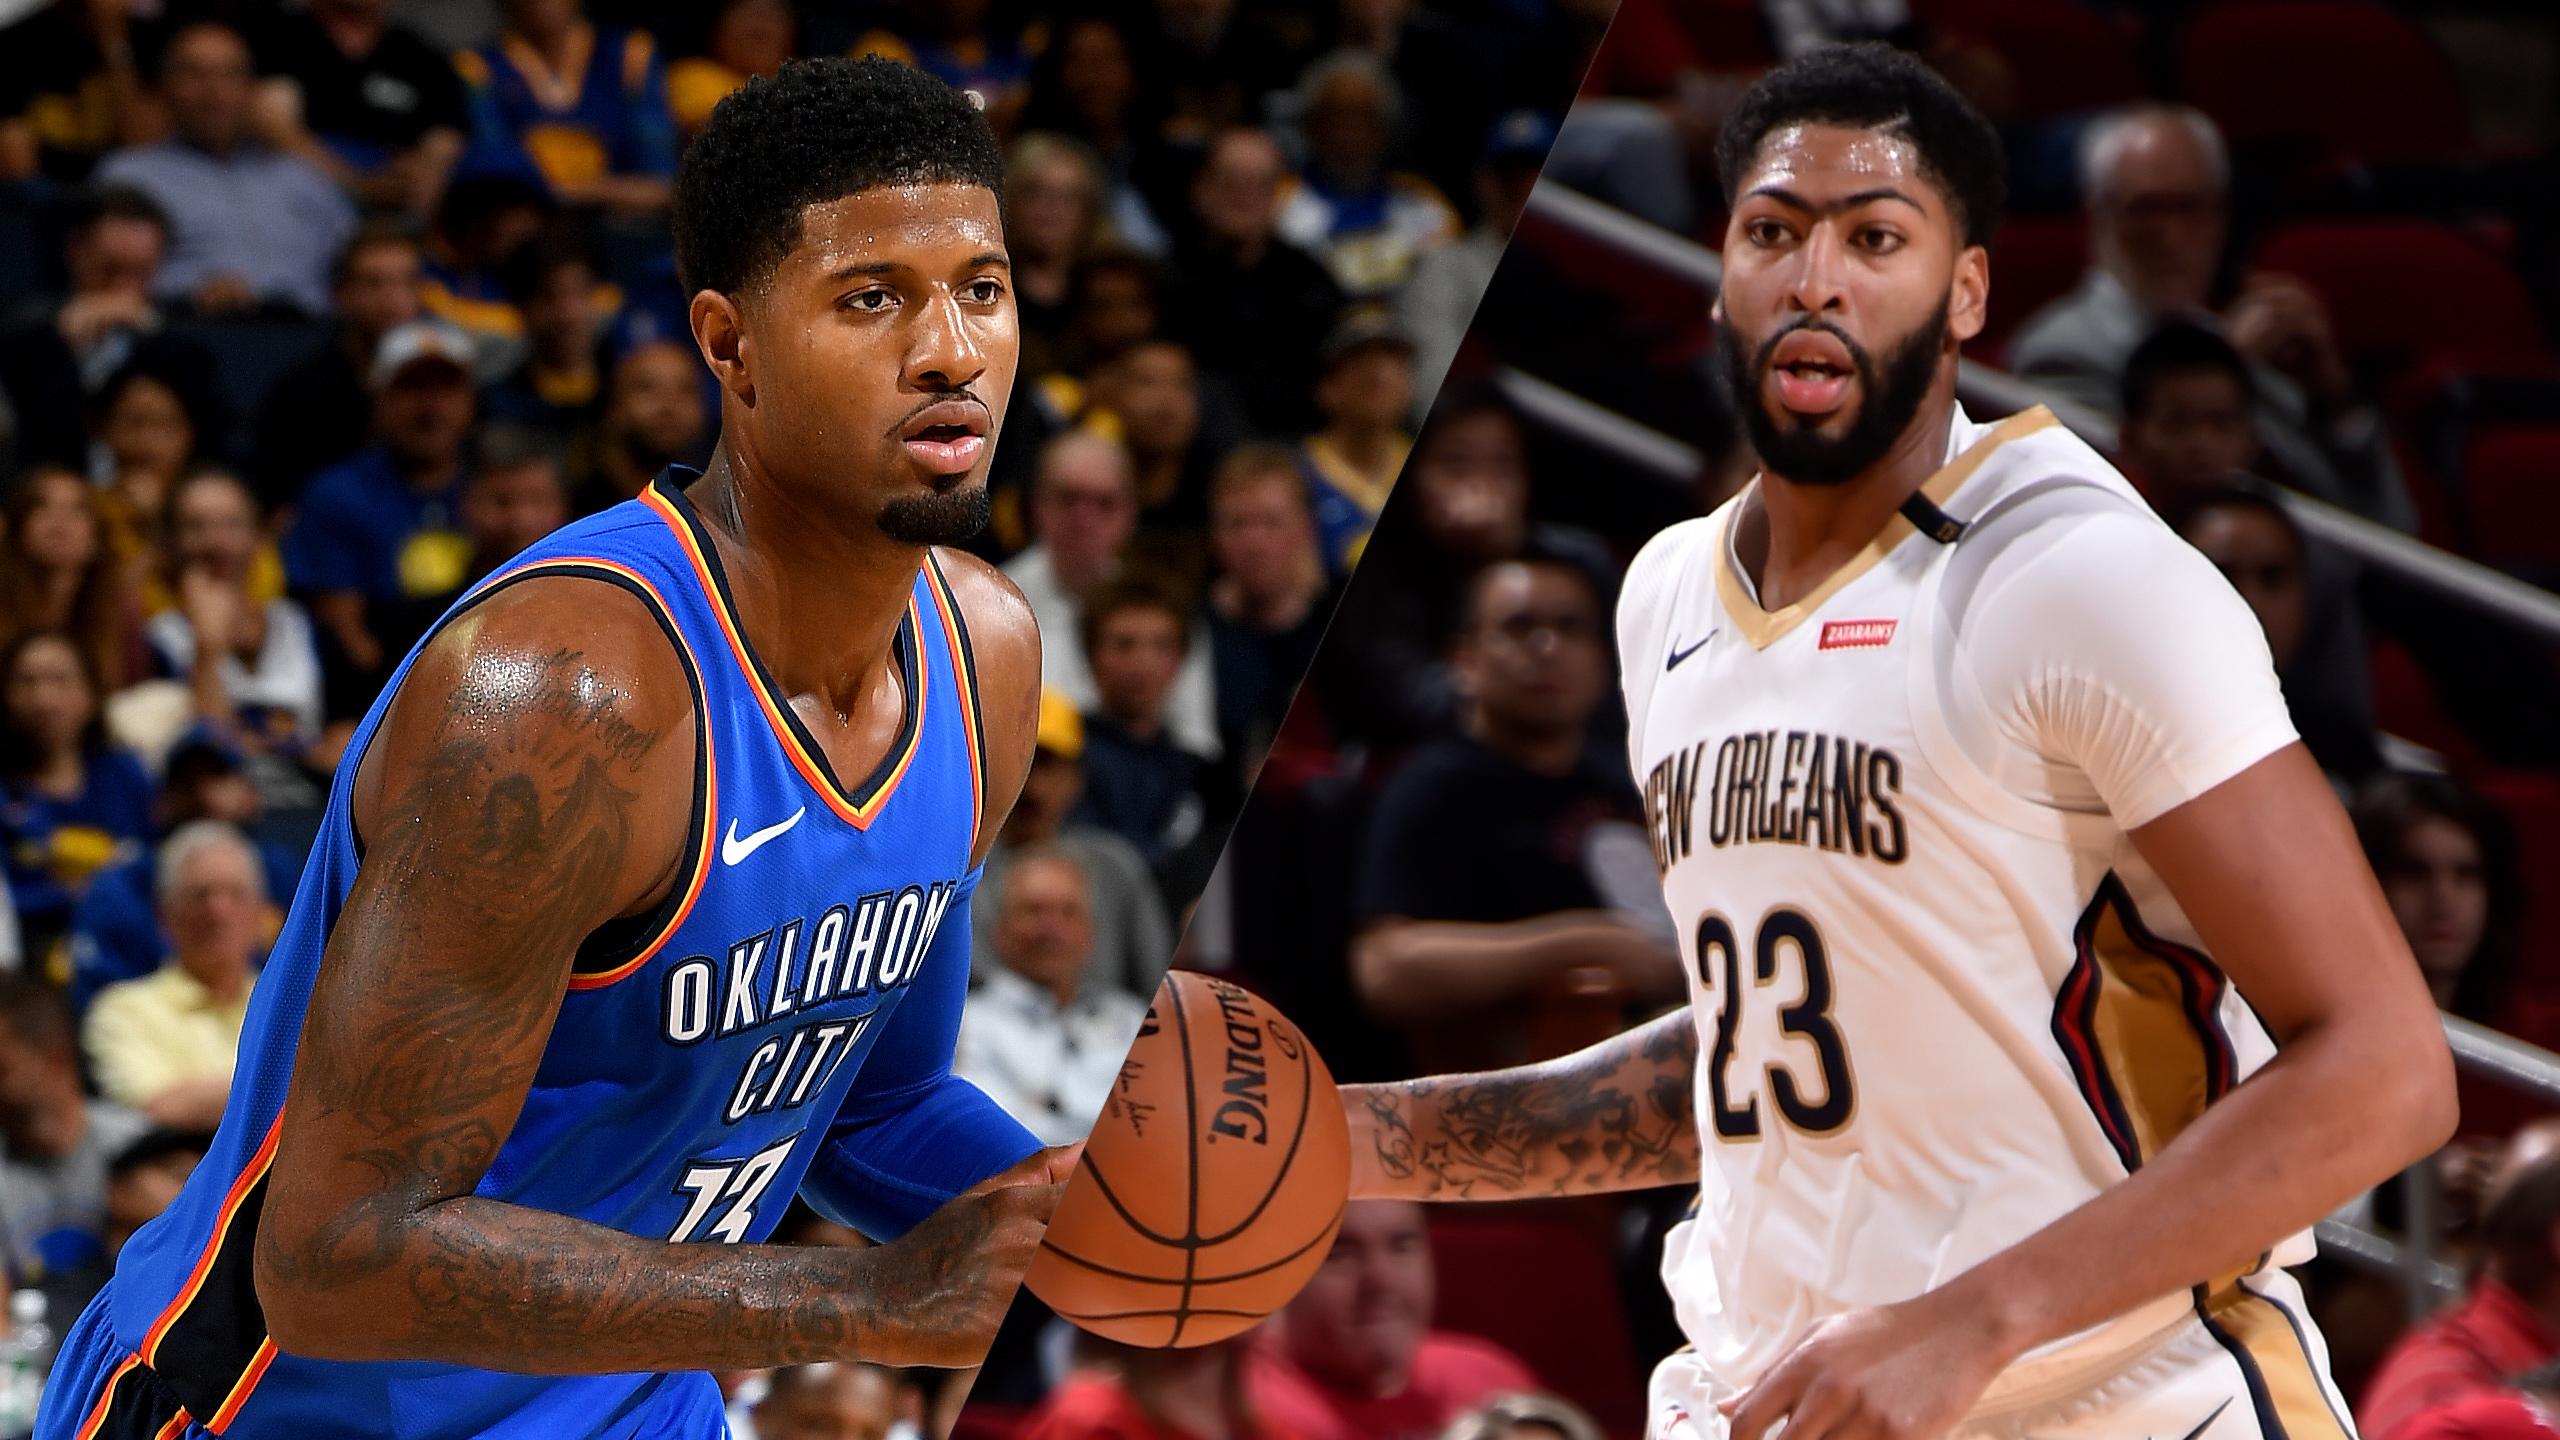 In Spanish - Oklahoma City Thunder vs. New Orleans Pelicans